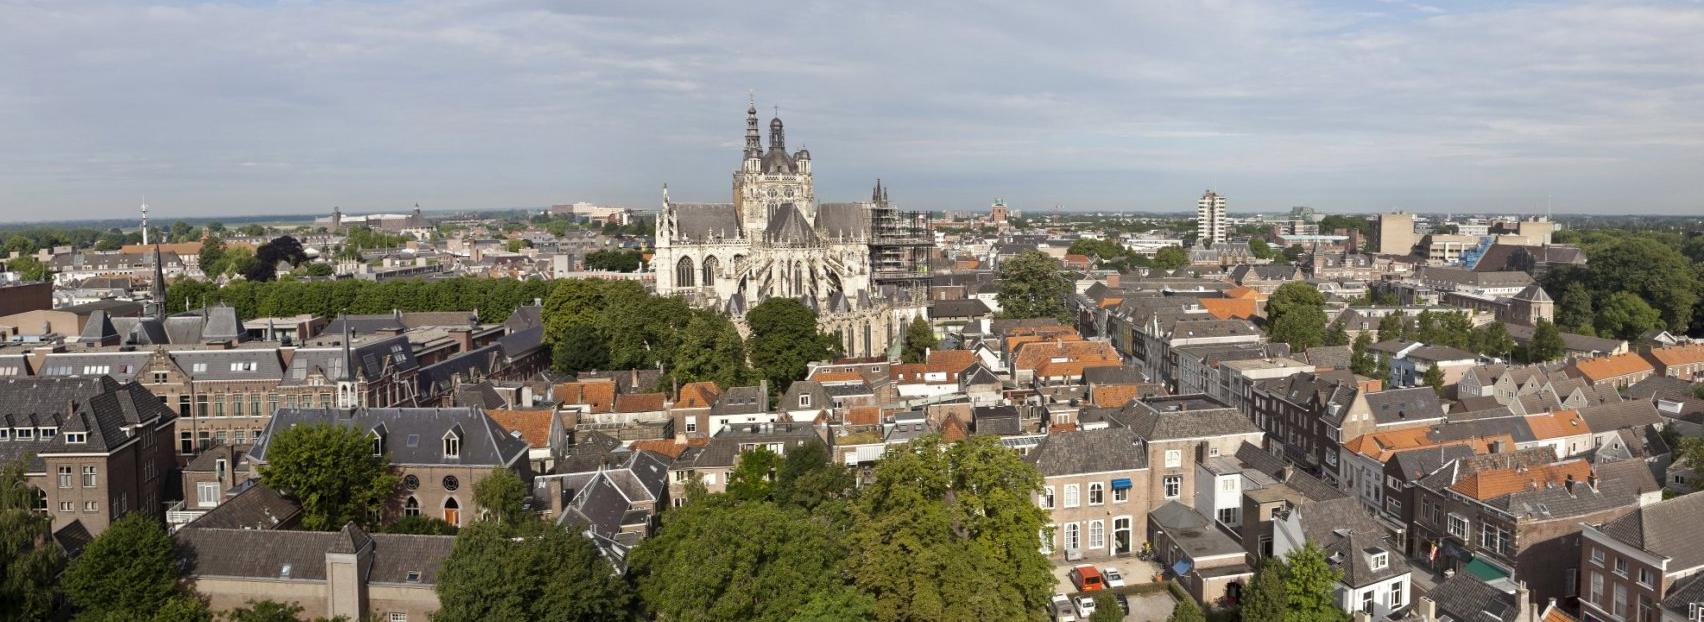 s'Hertogenbosch